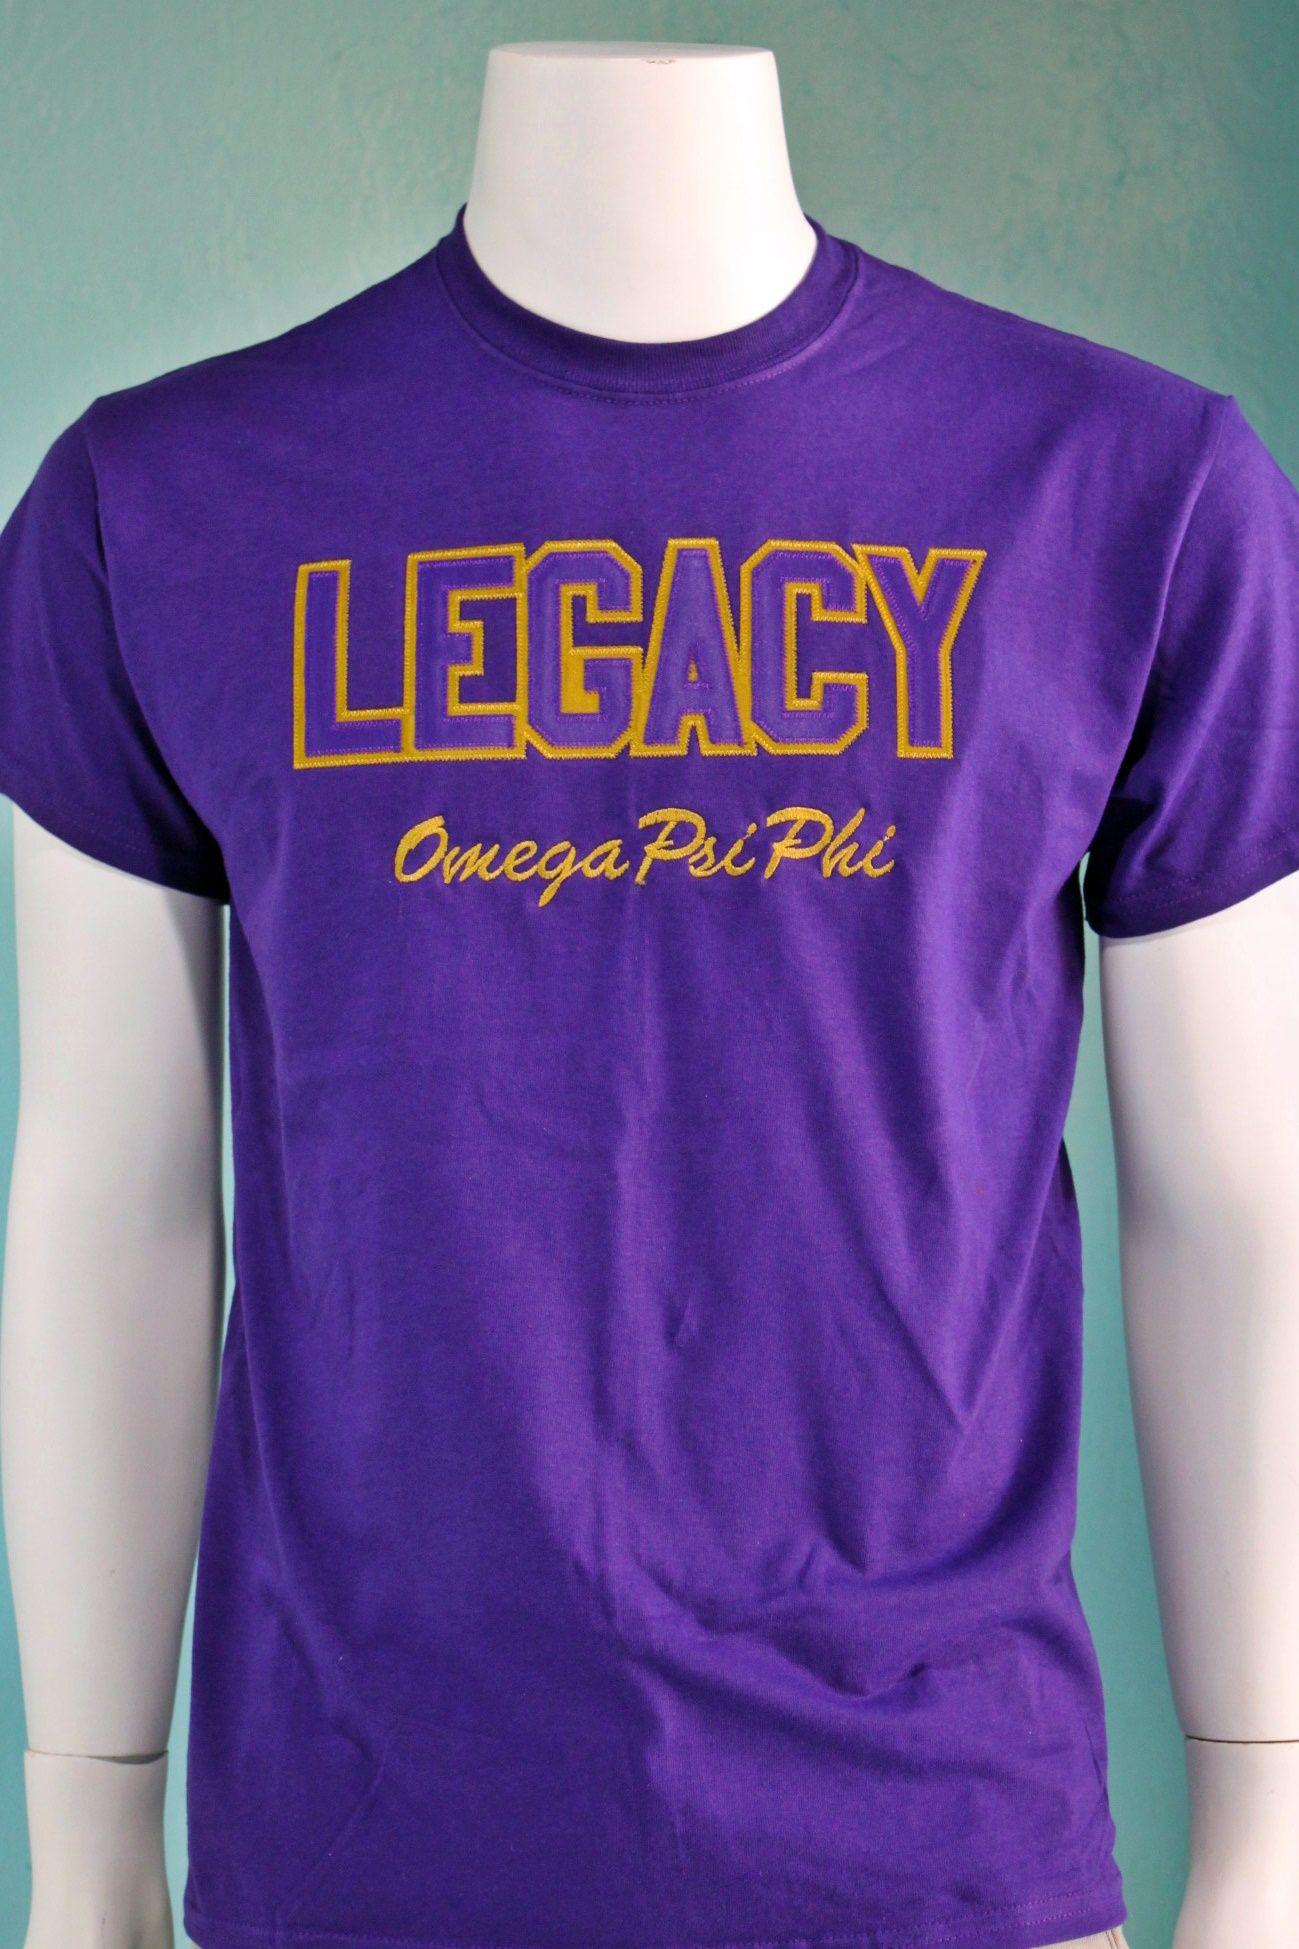 226c7f40592 Omega Psi Phi Legacy Tee